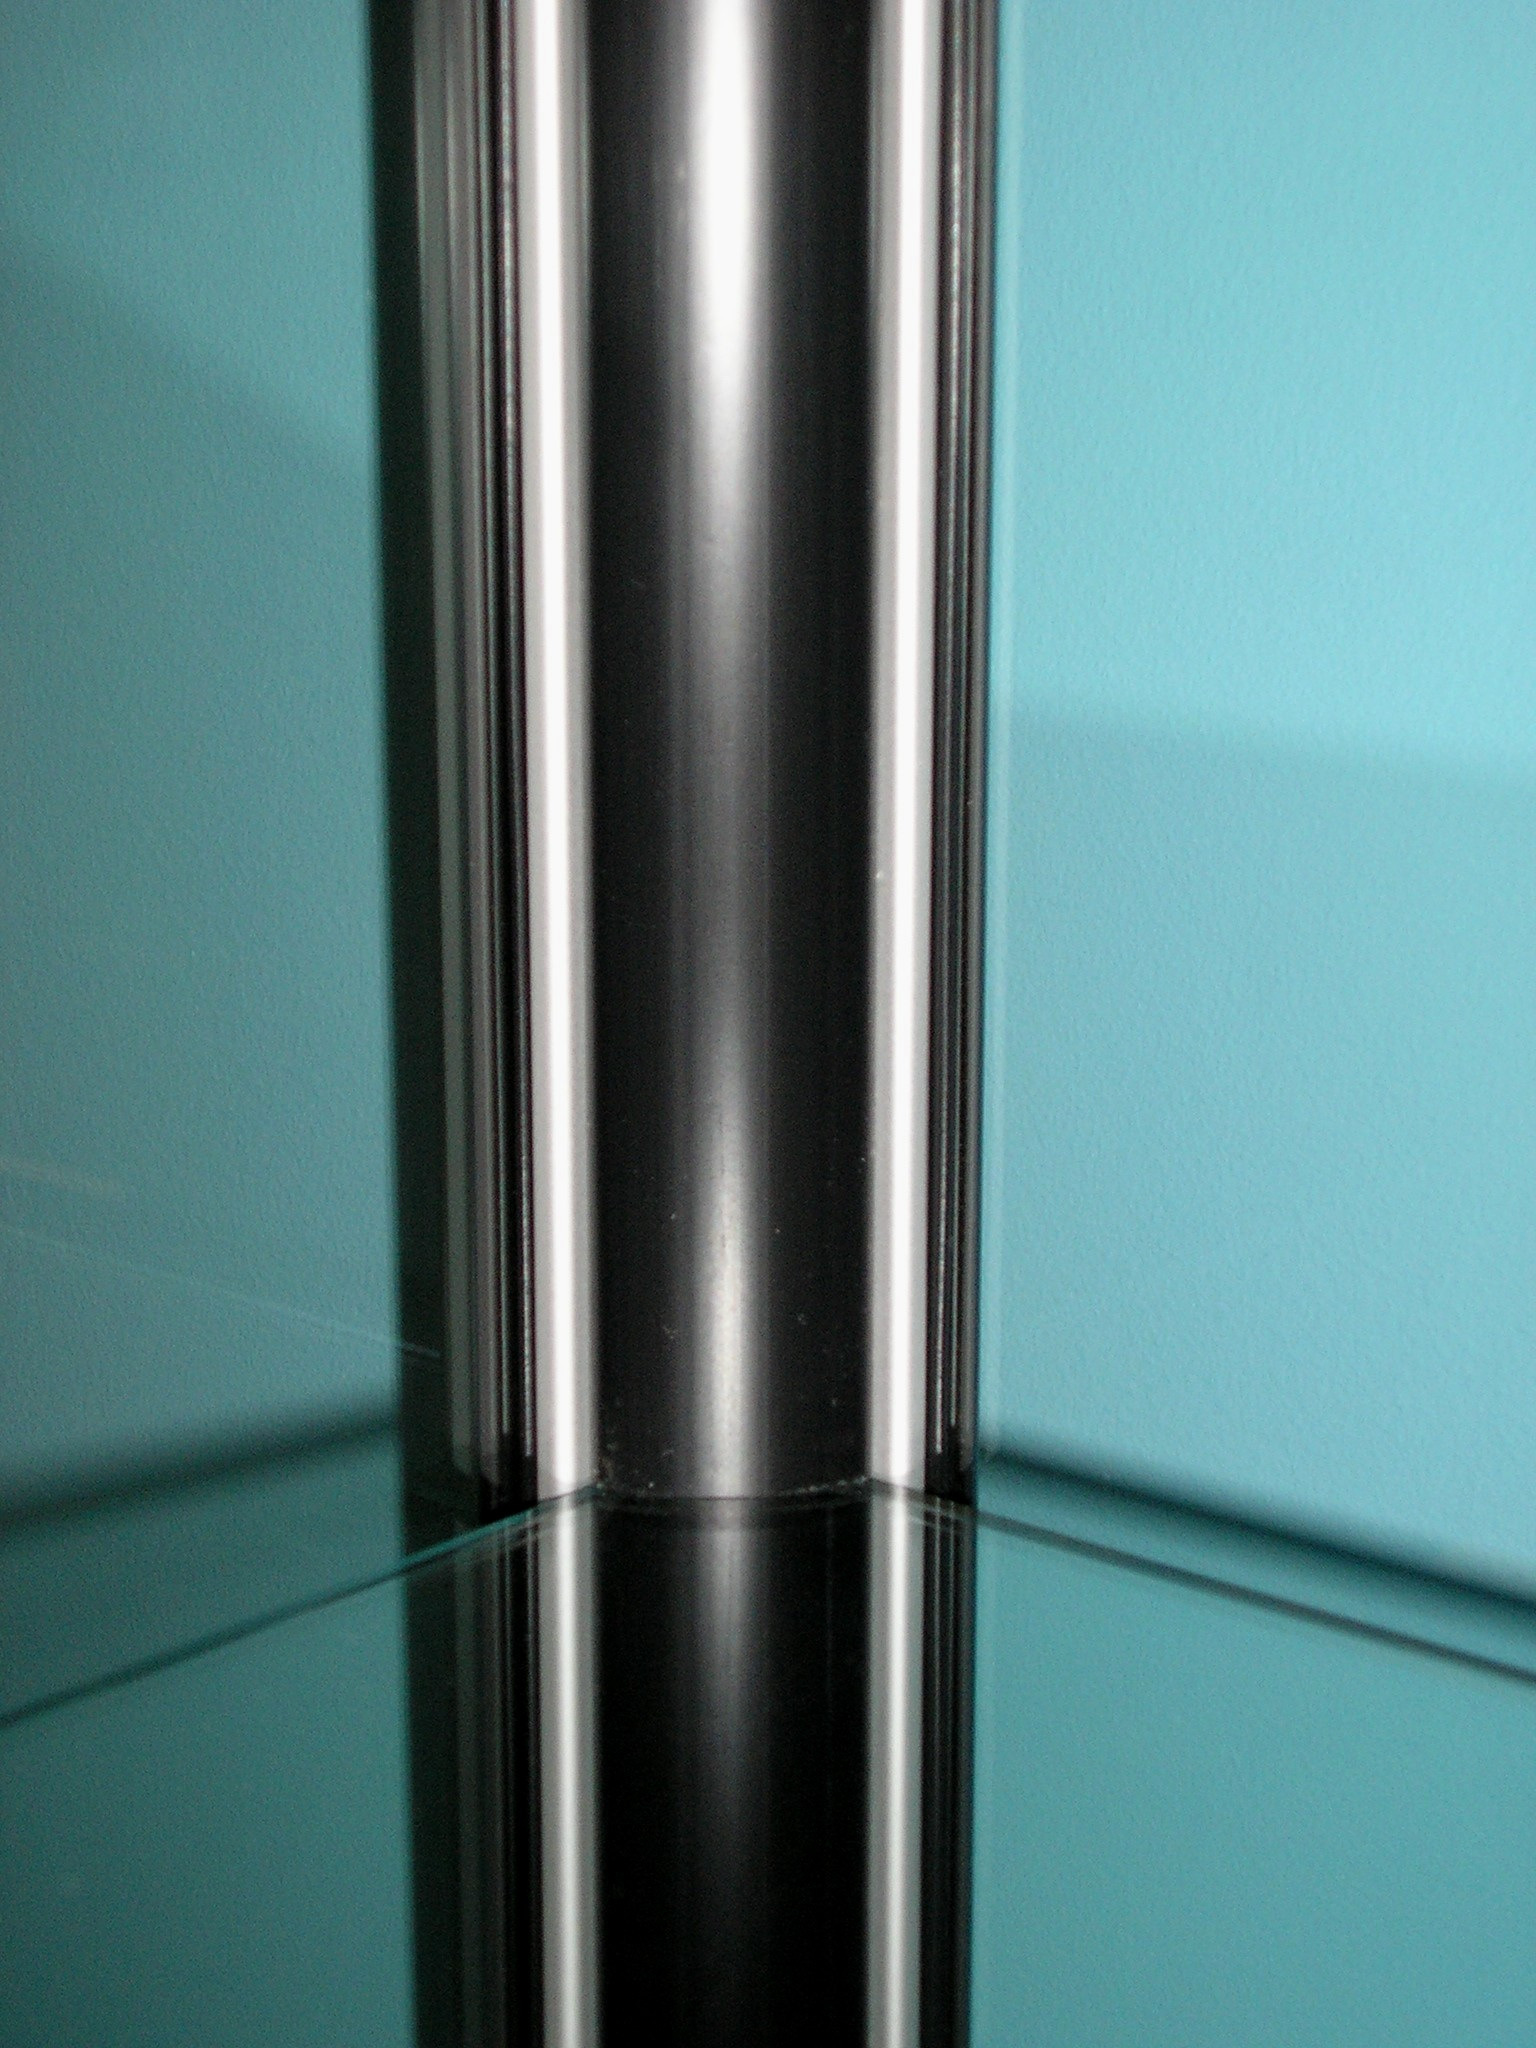 Designex Cabinets shelf support